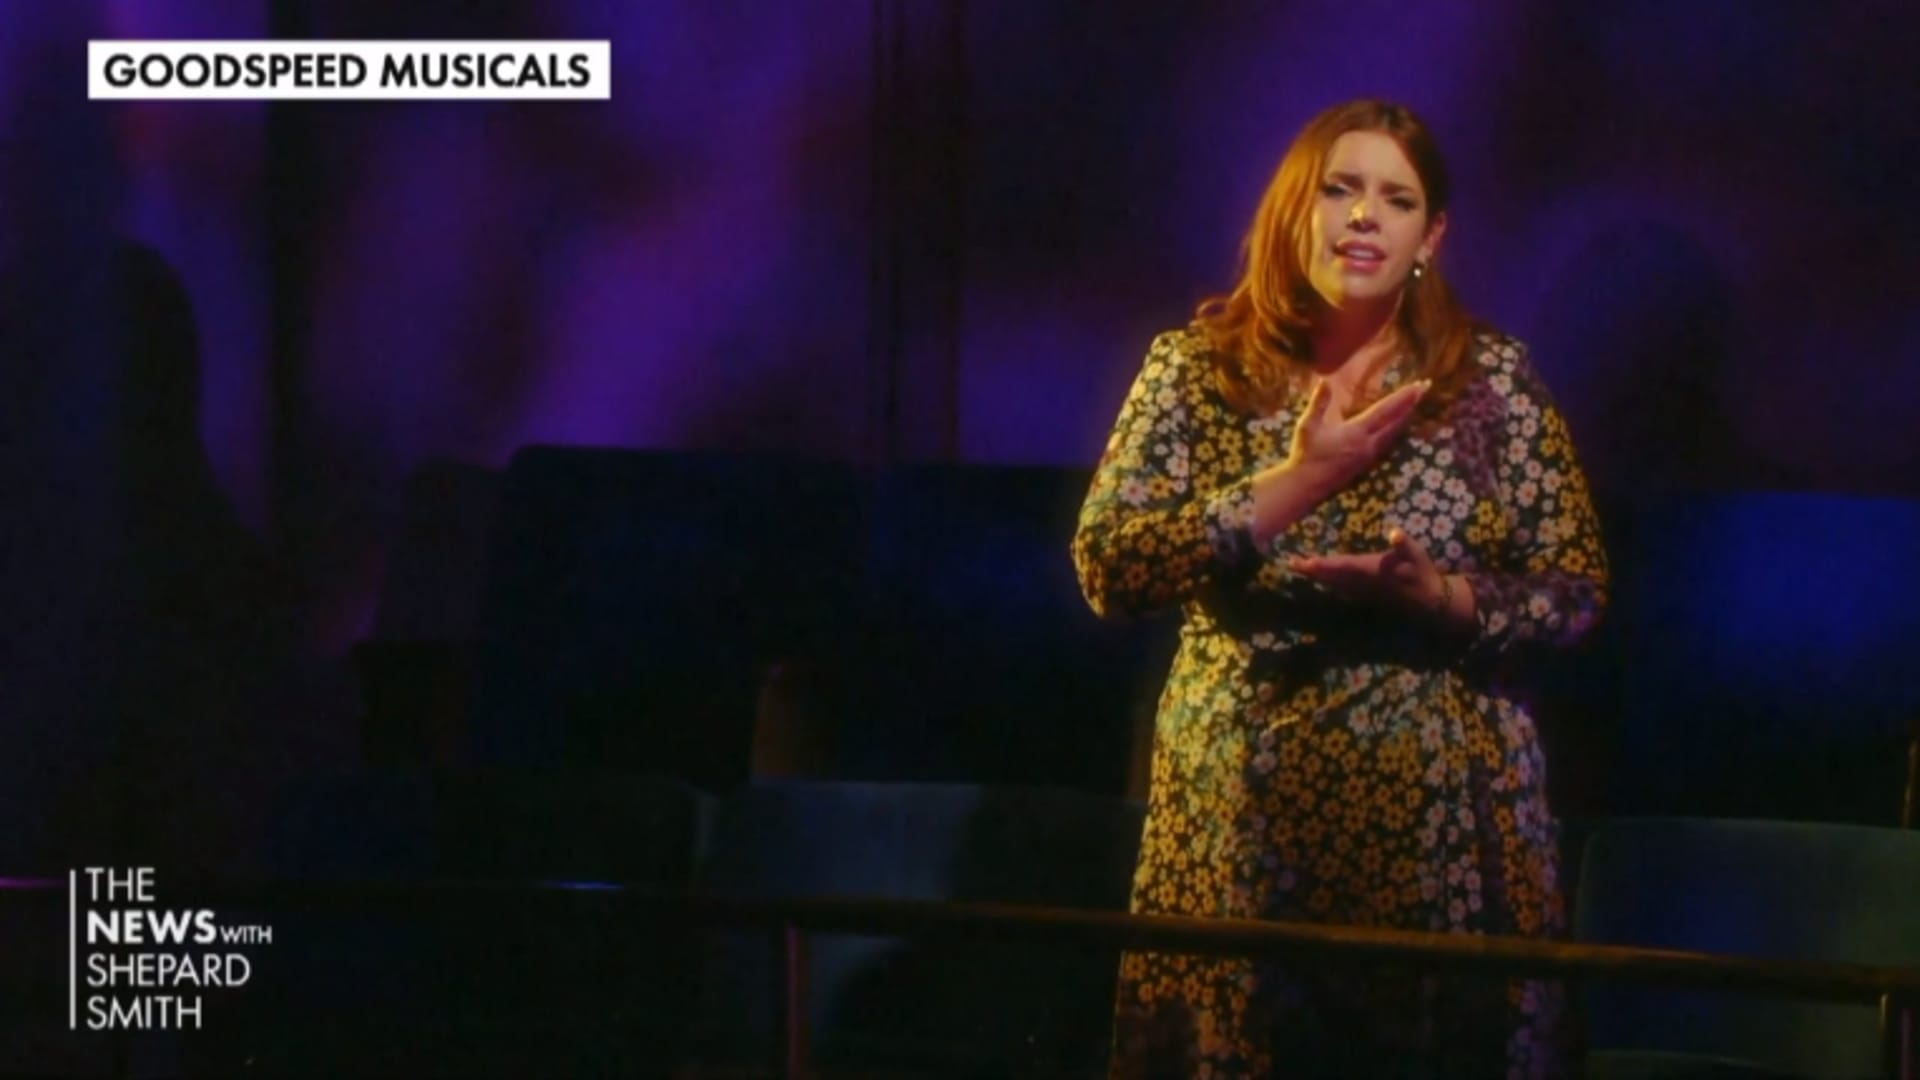 Actress Alysha Umphress sings for Goodspeed Musicals virtual gala.